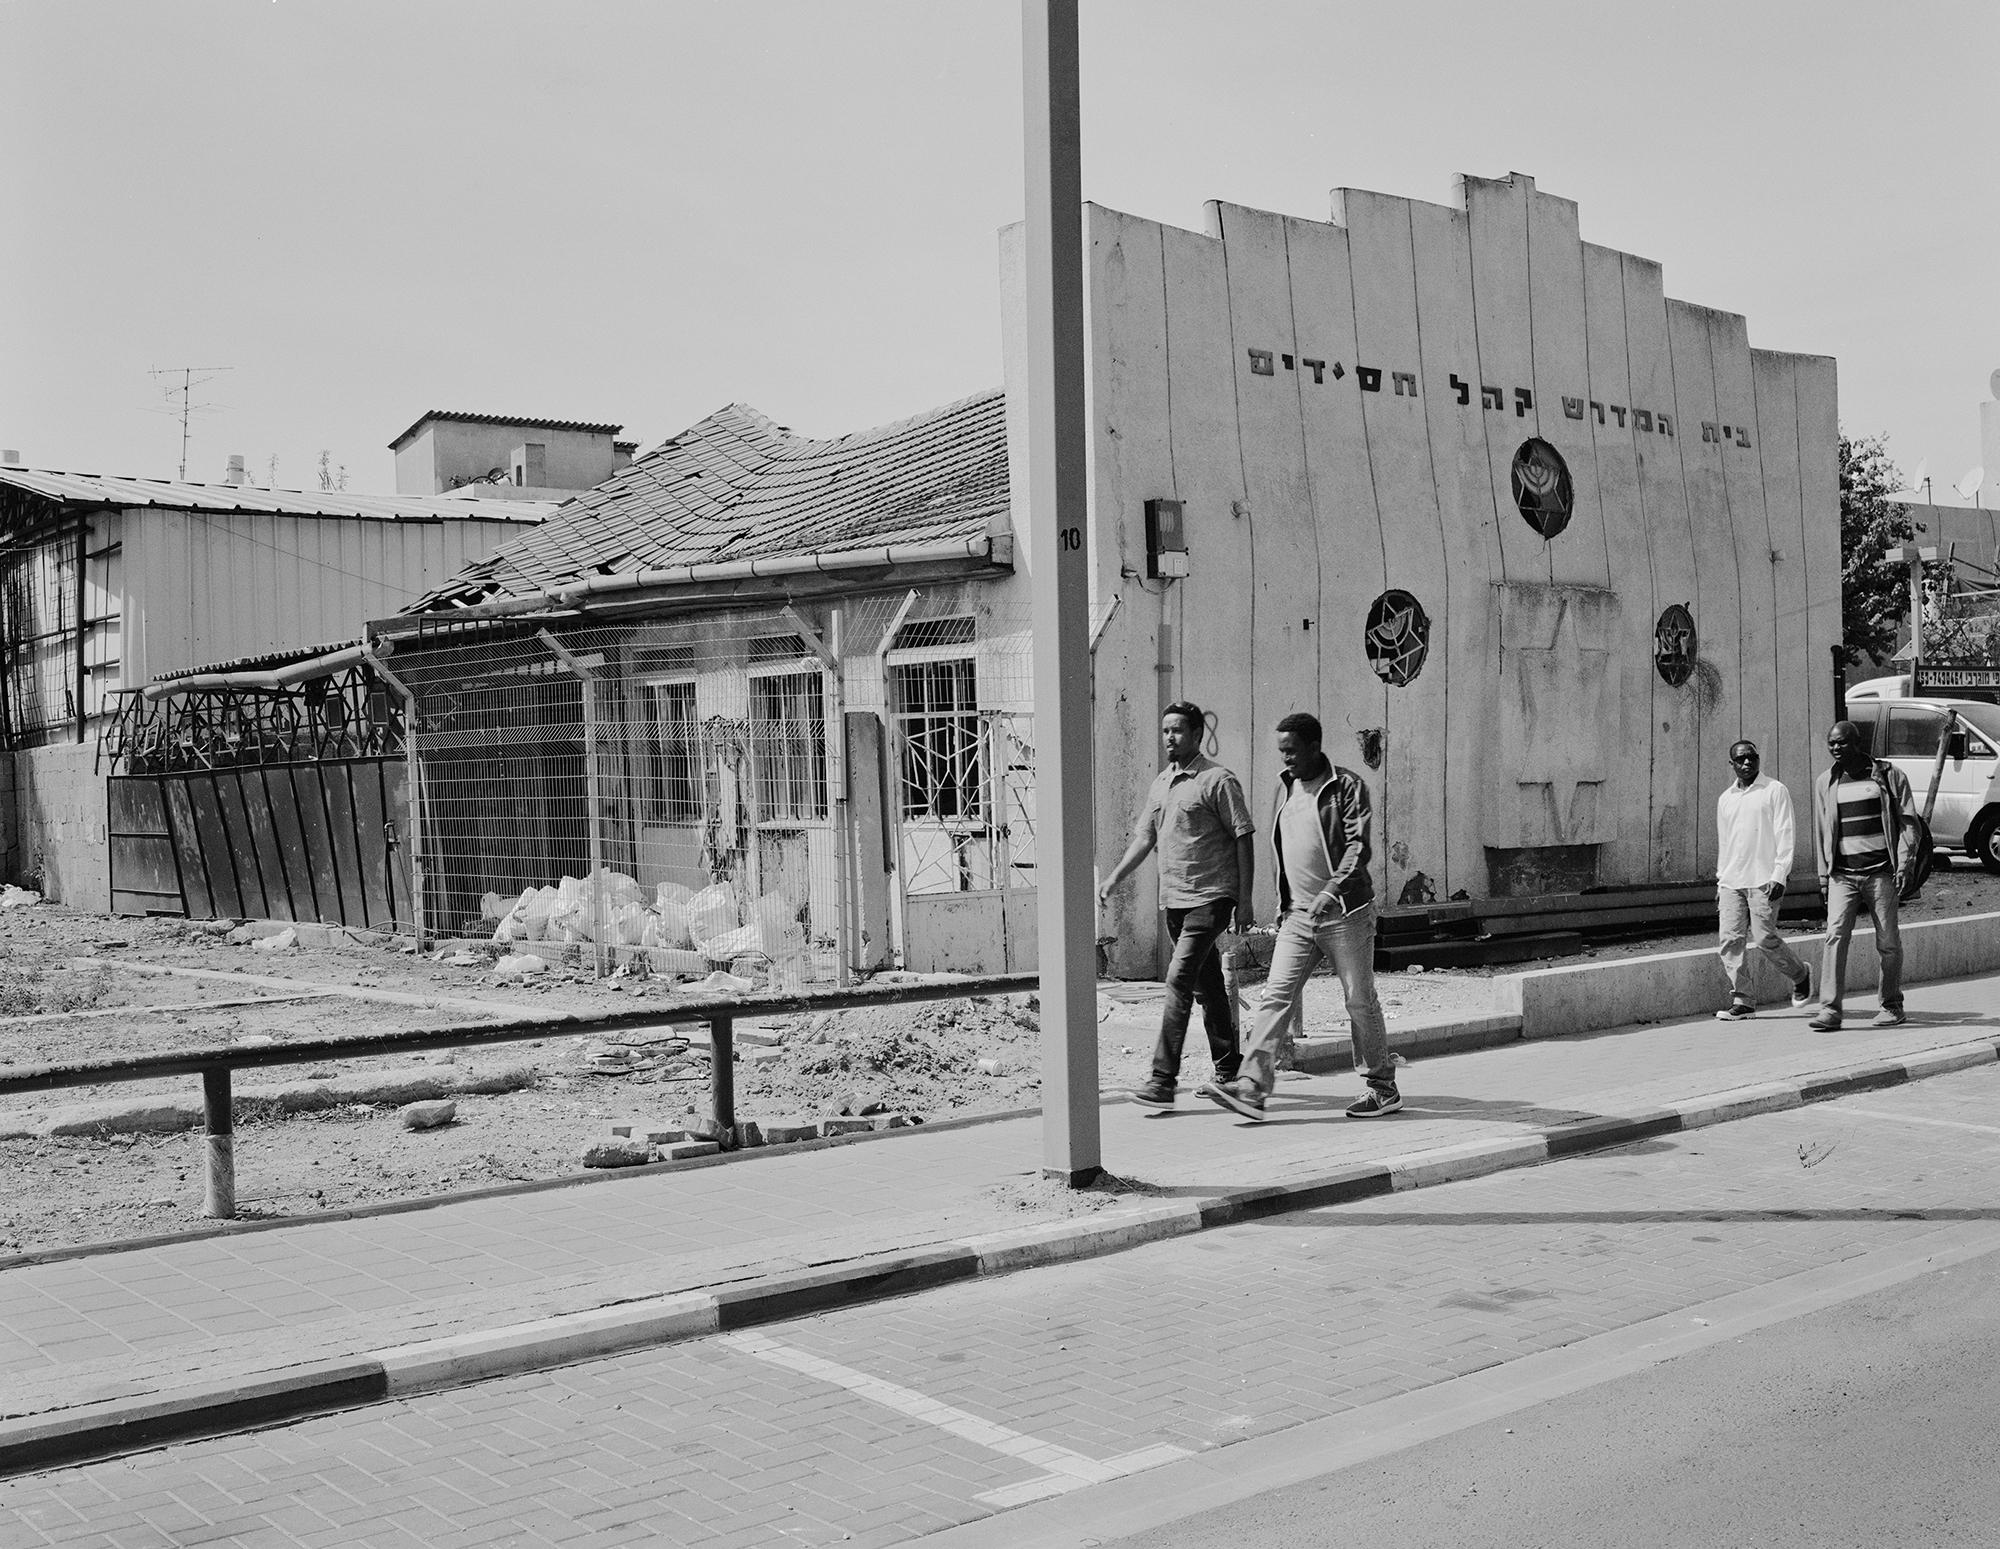 Menashe Ben Yisra'el, Neve Sha'anan 2015